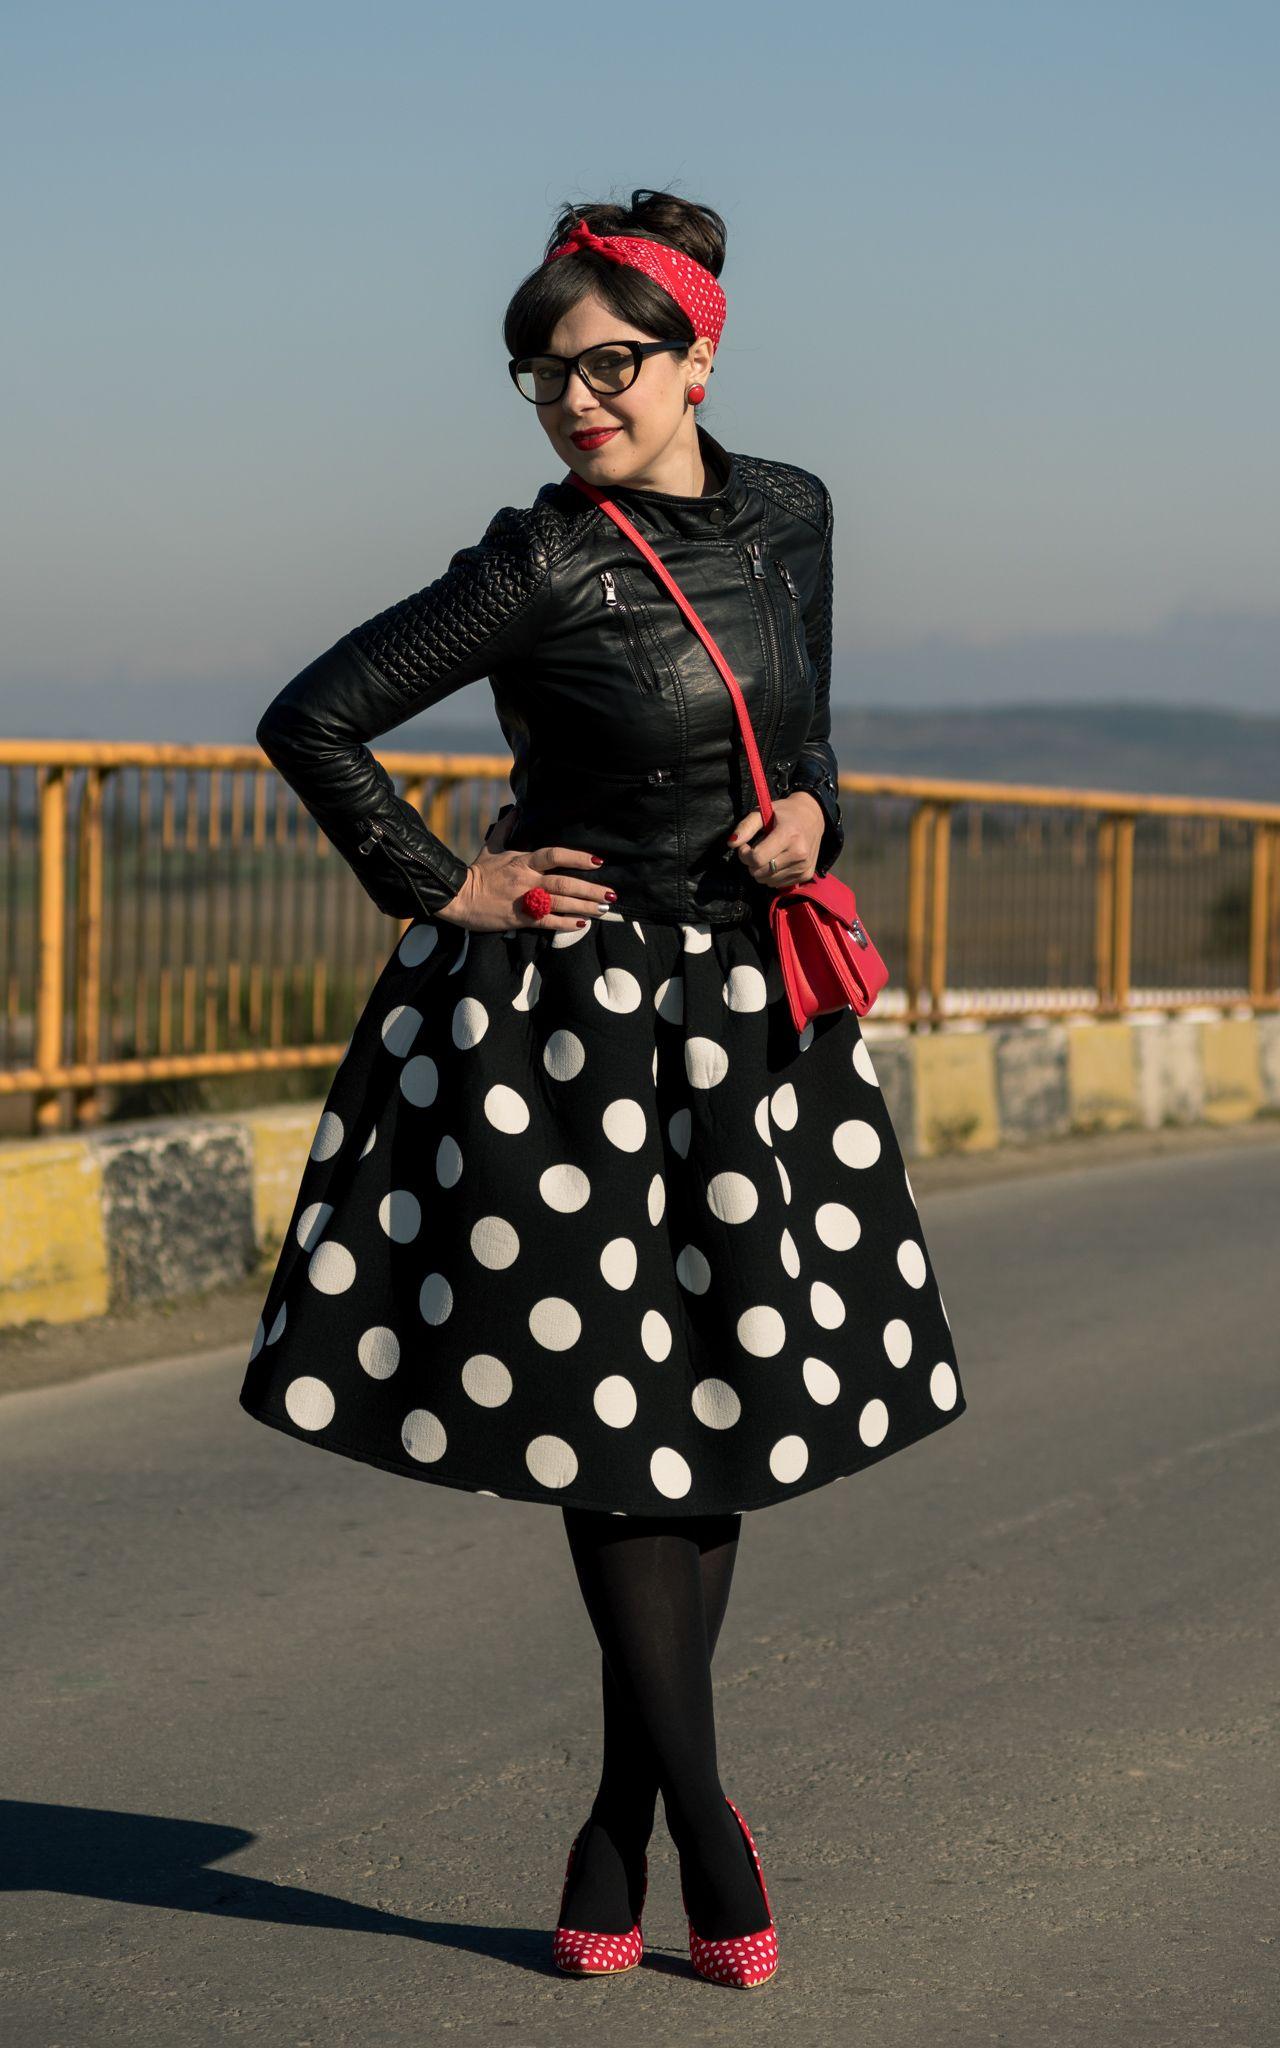 easy diy halloween costume - modern pin up girl | rockabilly style